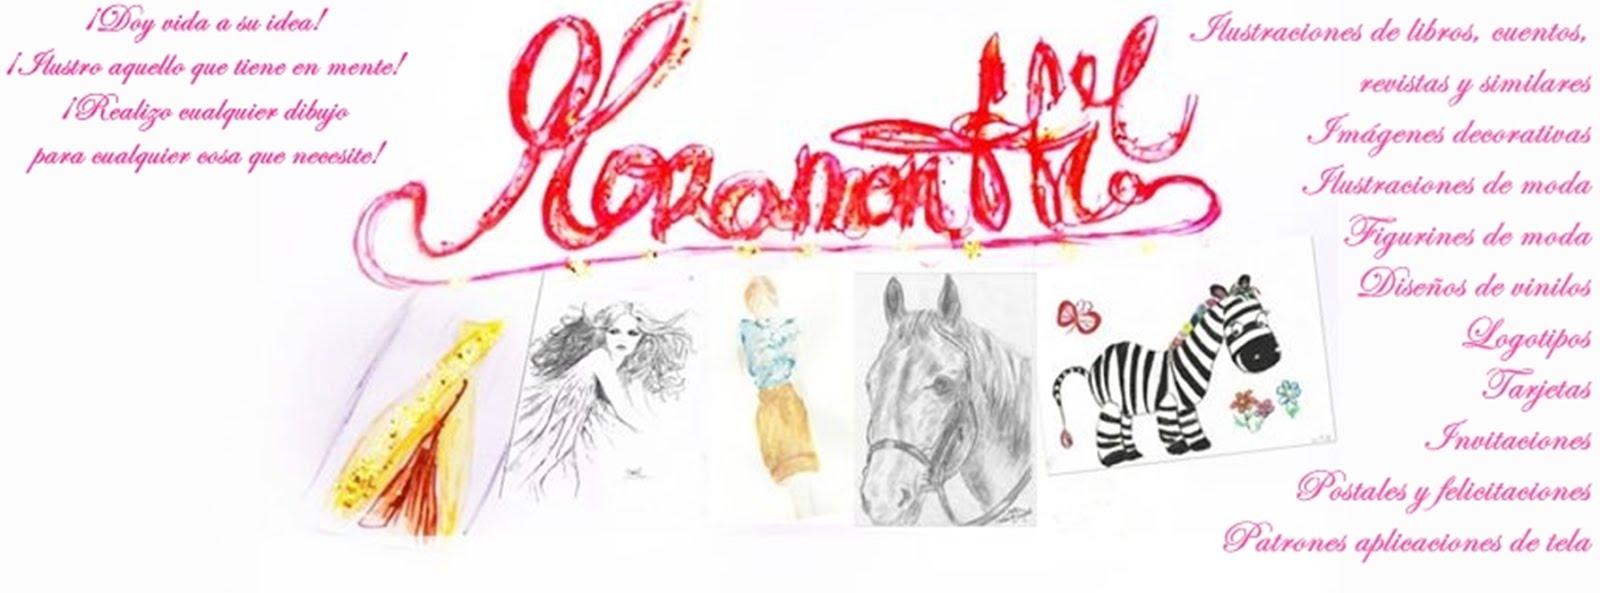 Ilustraciones Moramontti